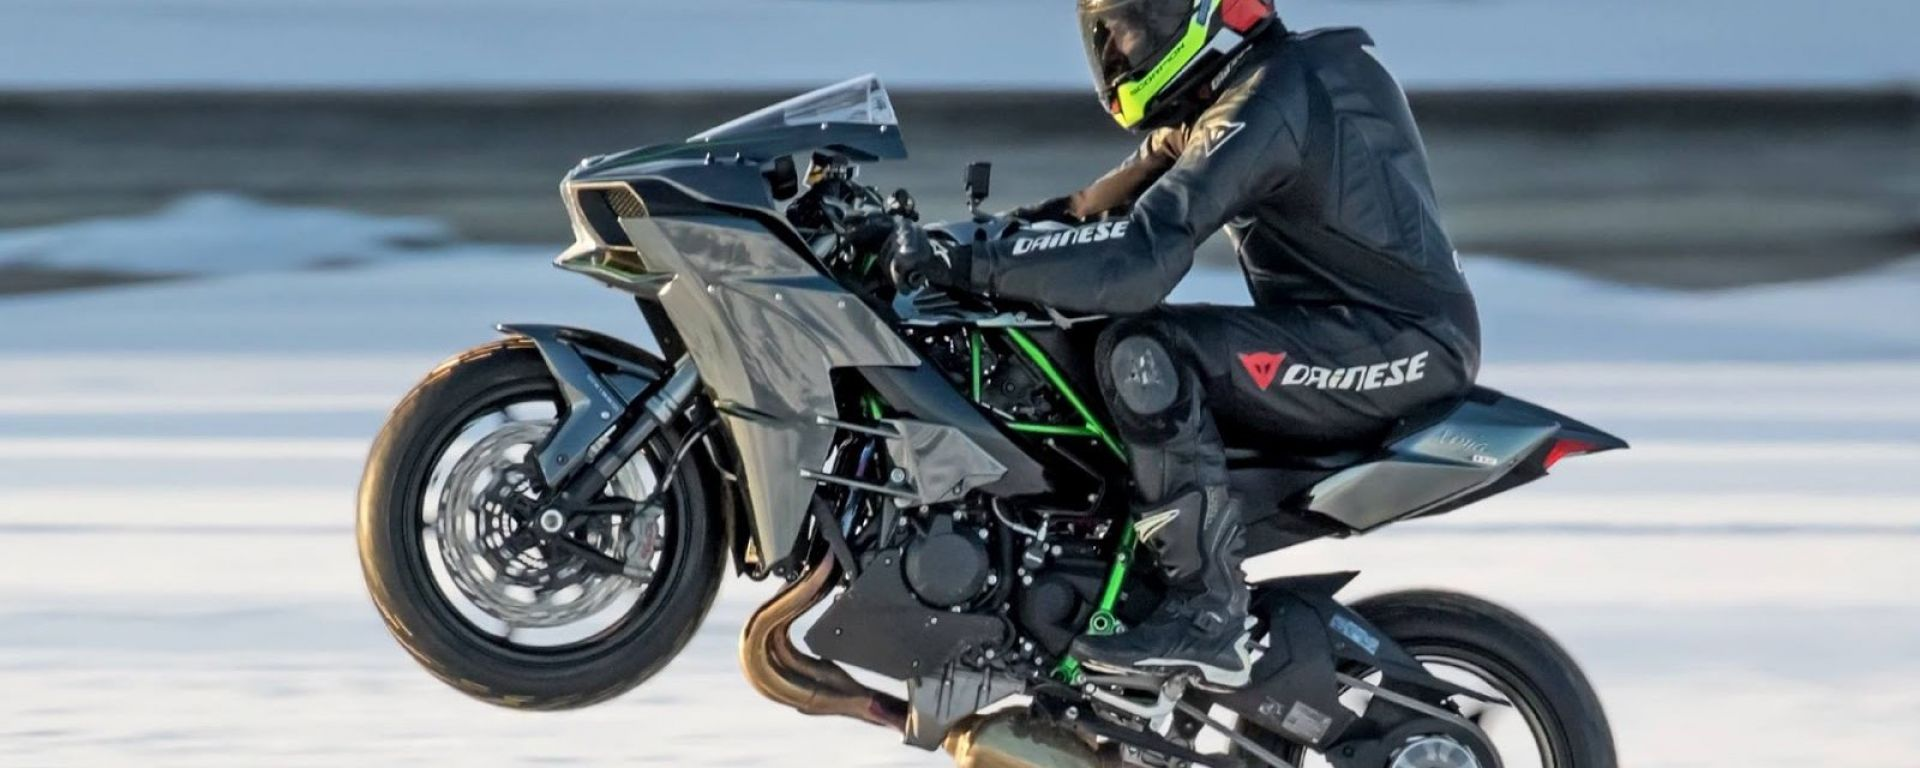 Una Kawasaki Ninja H2 Per Battere Il Record Di Impennata